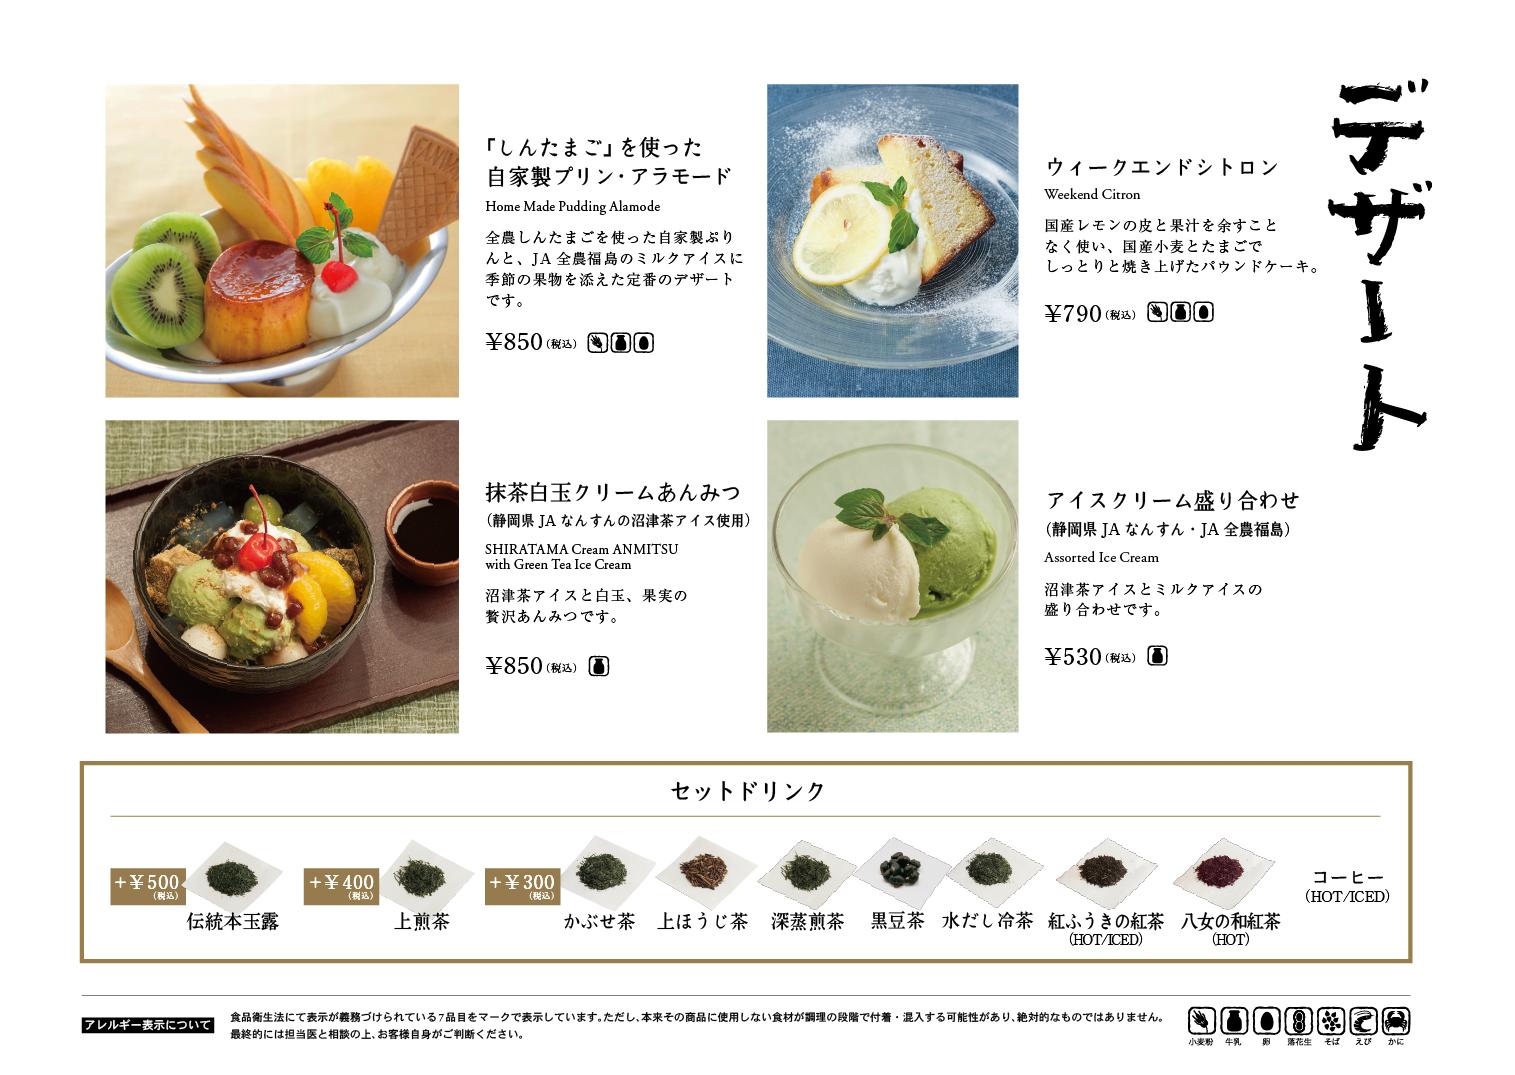 縺ソ縺ョ繧・minoru_oyatsu_menu_1806_07.png